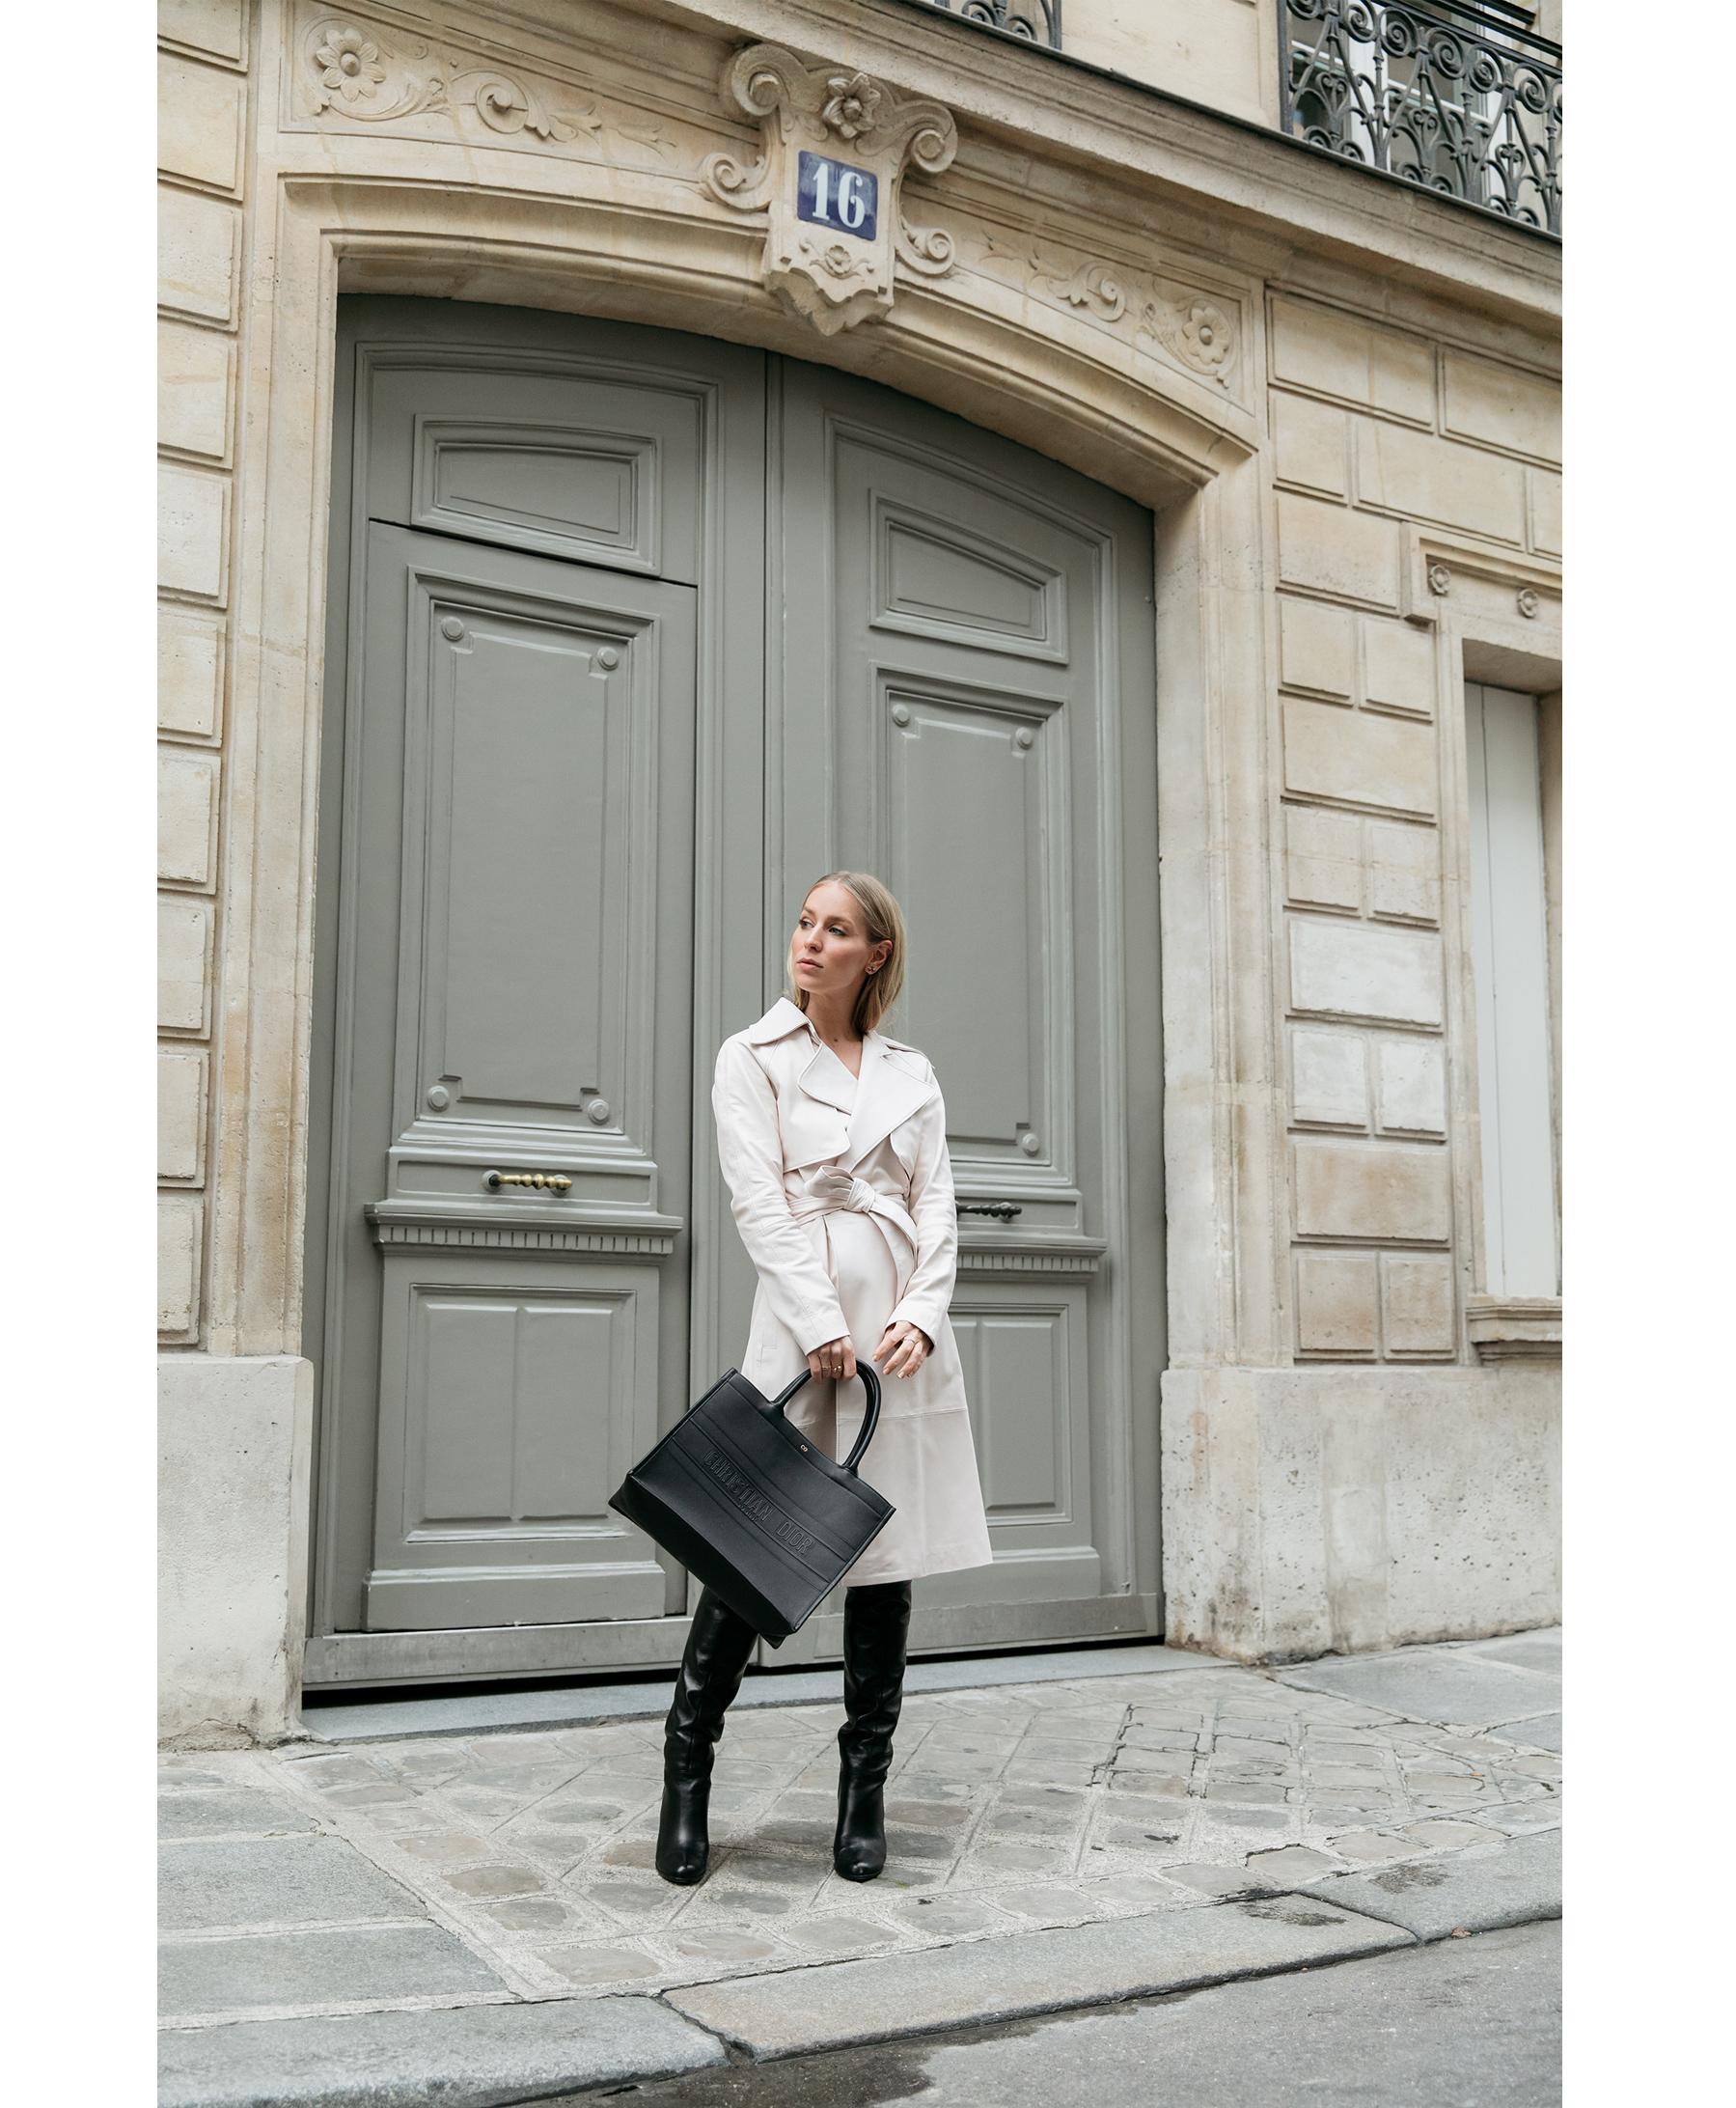 ParisFashionWeek_CarinOlsson_04.jpg